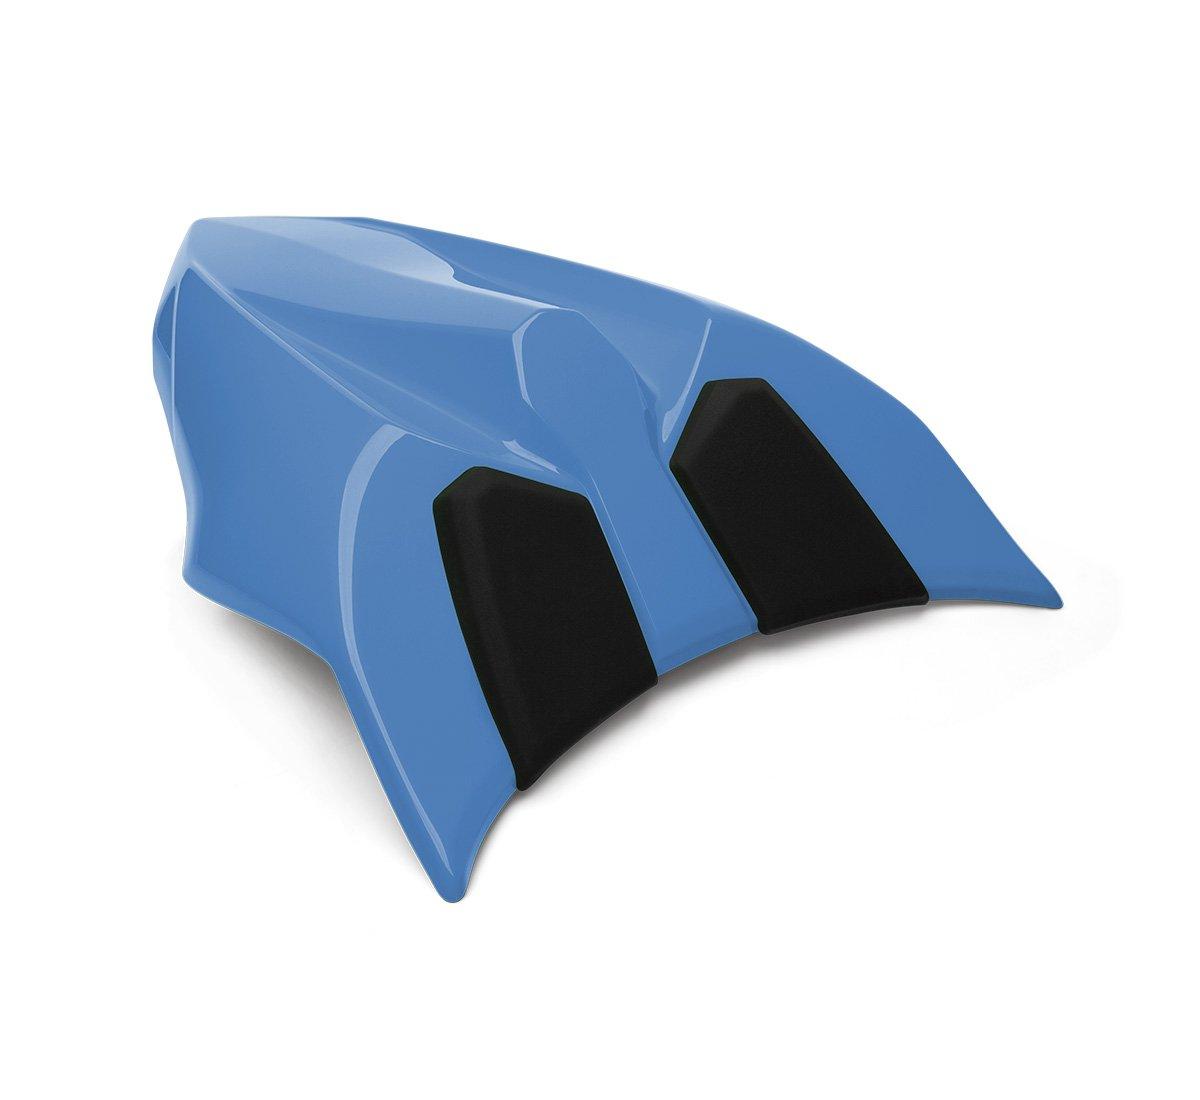 Kawasaki Genuine 2018 Ninja 650 Candy Plasma Blue SEAT Cowl